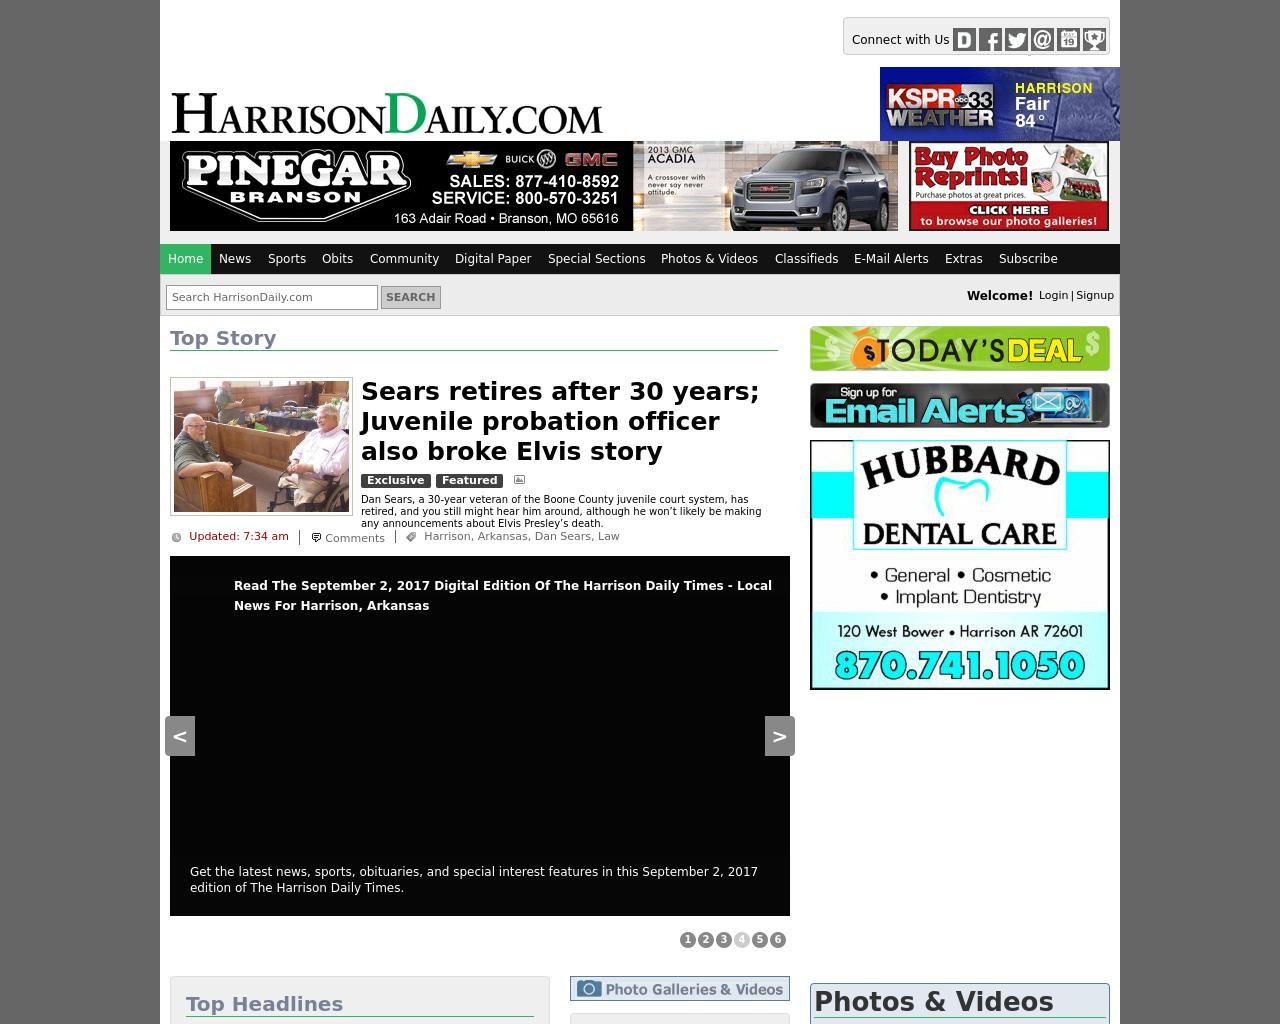 HARRISONDAILY.COM-Advertising-Reviews-Pricing